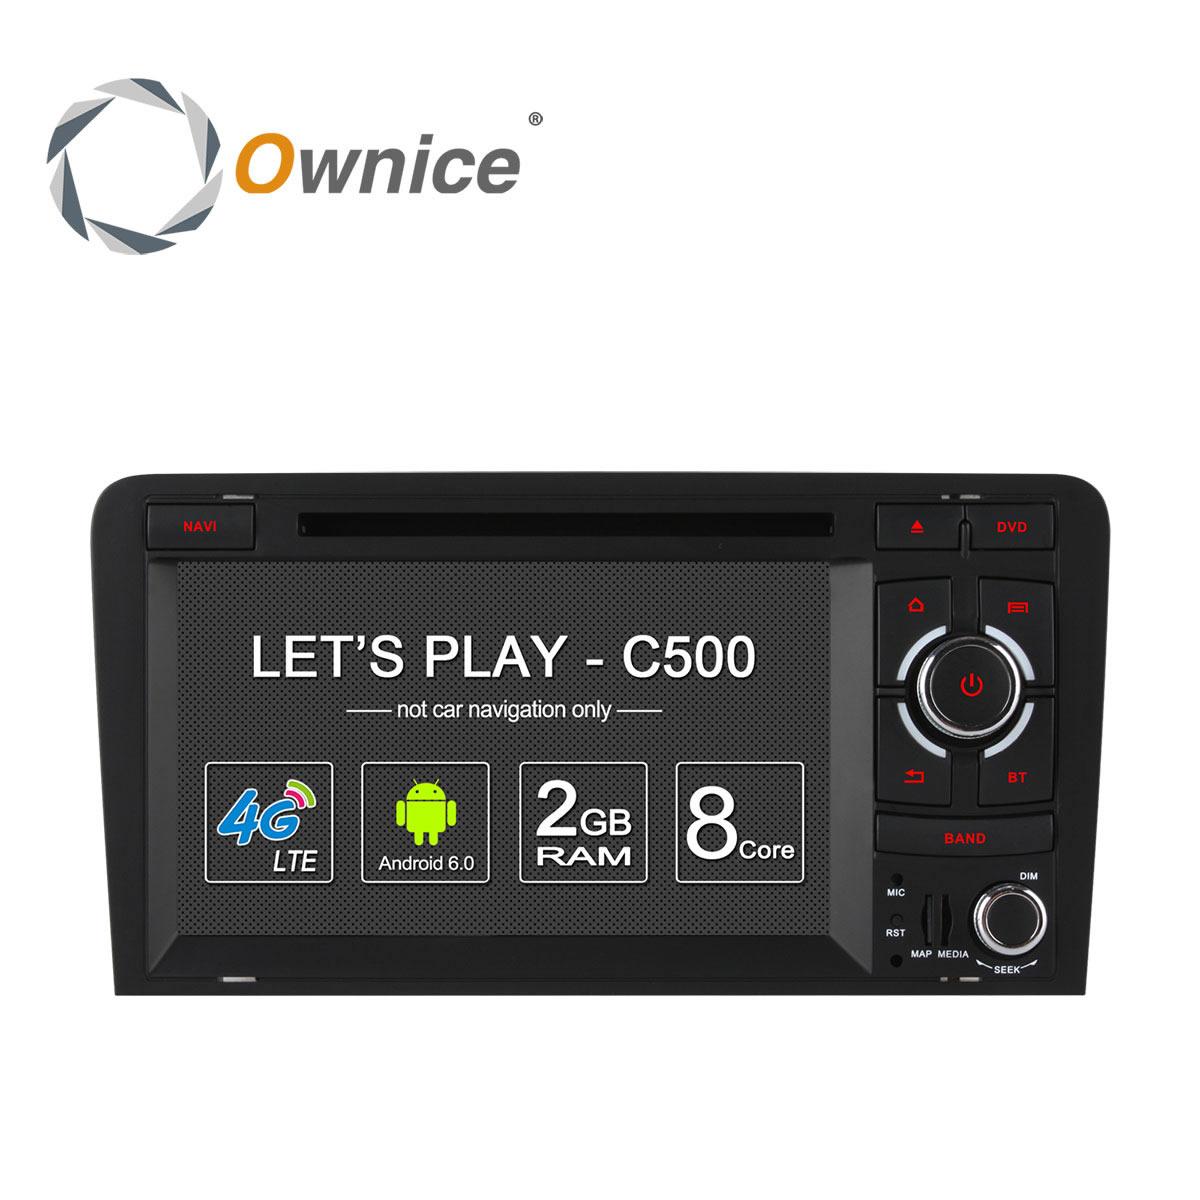 "Audi A3, S3 2003-2011 :: Màn 7"" :: Ownice C500 :: 32GB :: OL-7966G"